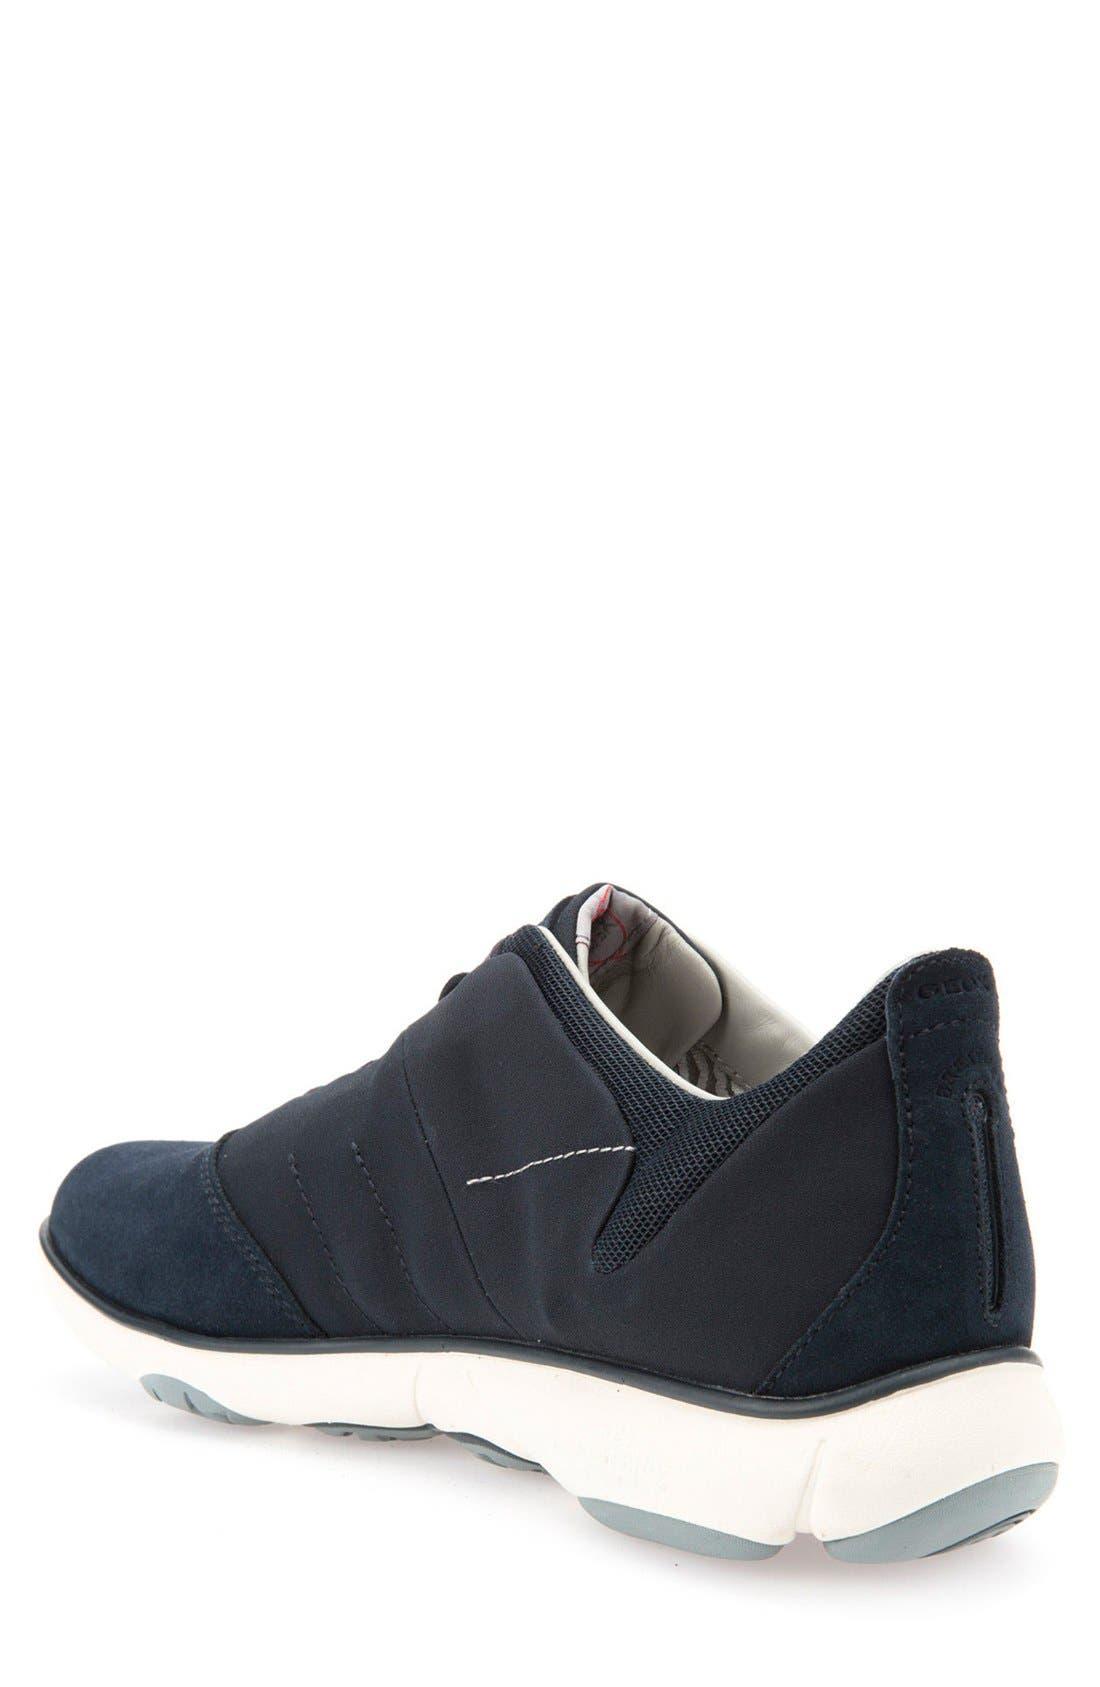 Nebula10 Slip-On Sneaker,                             Alternate thumbnail 2, color,                             NAVY SUEDE